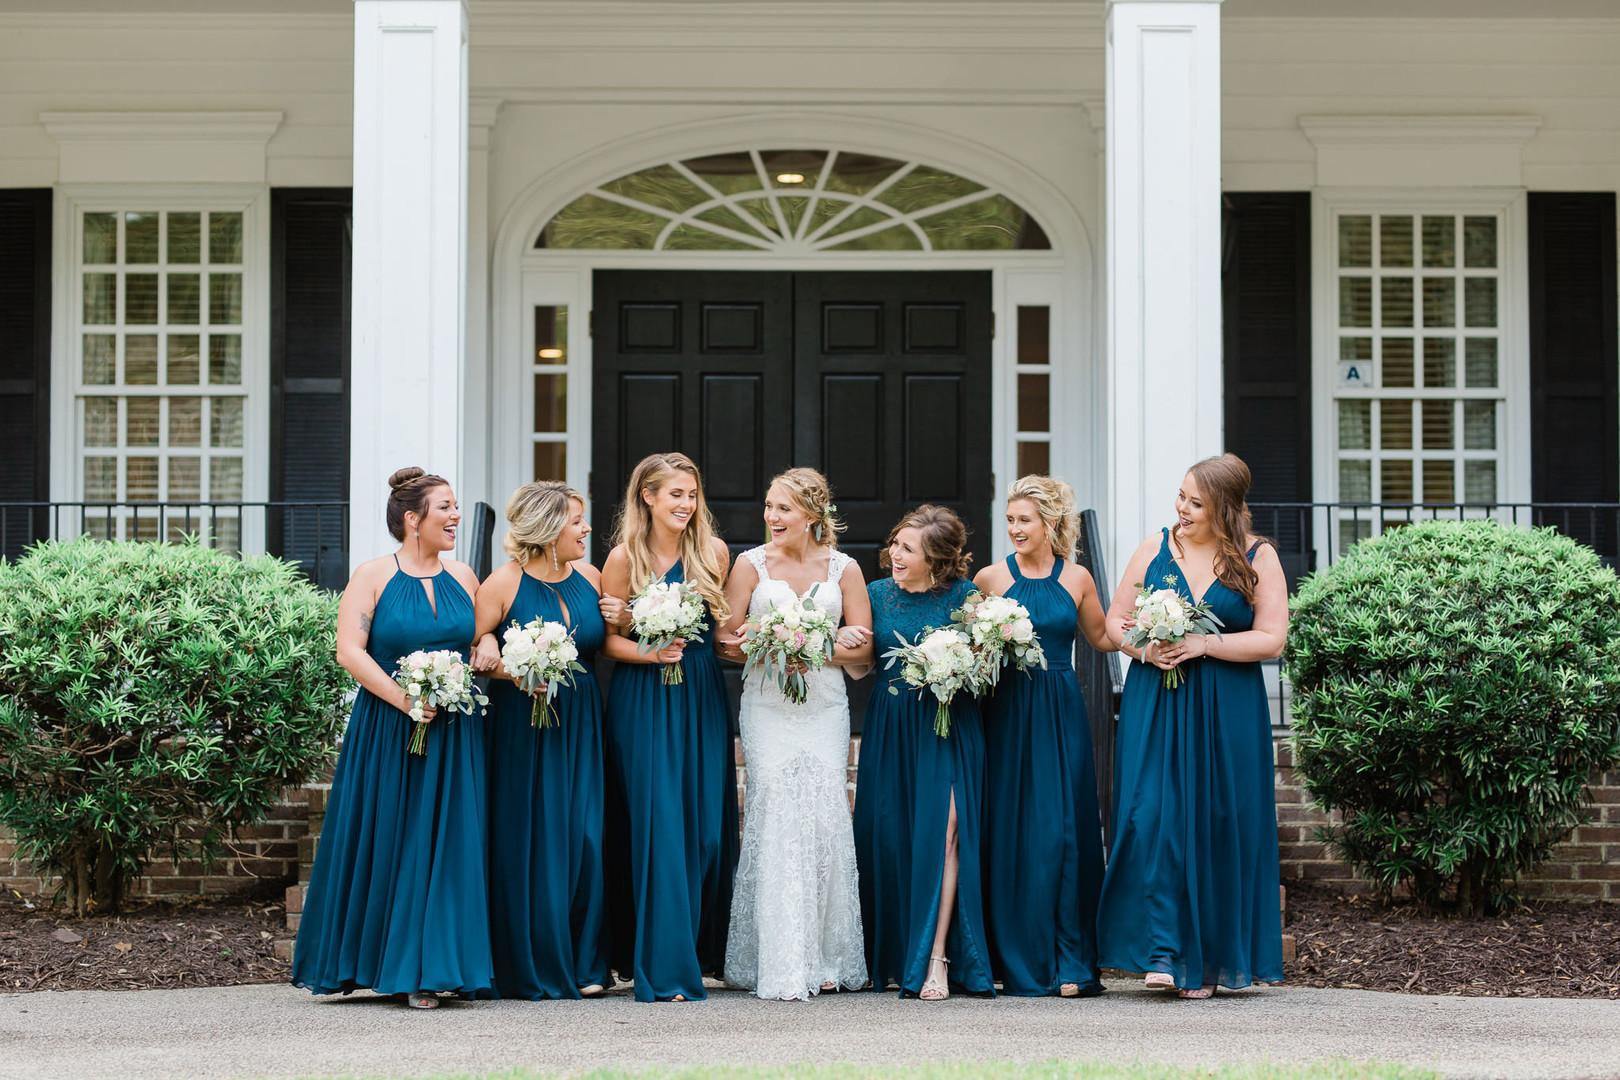 pawleys-plantation-wedding-11.jpg